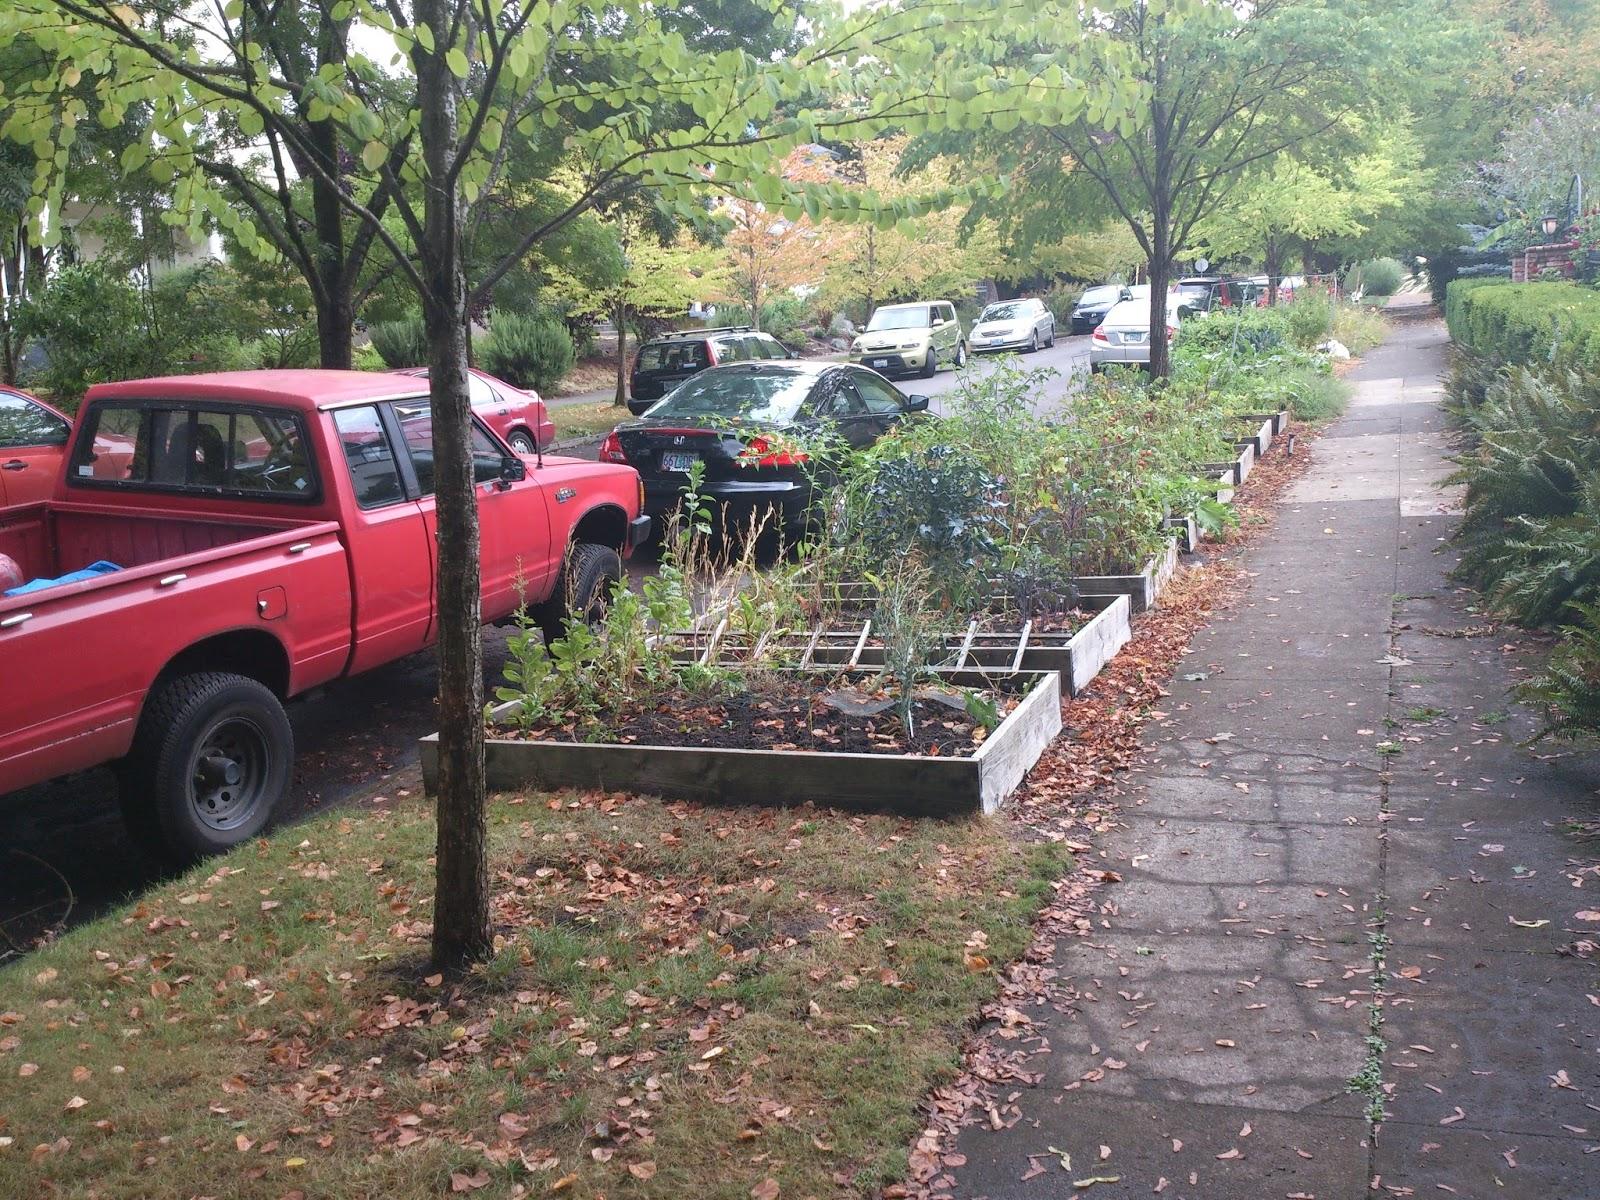 Safegrowth Magic Sidewalk Gardens